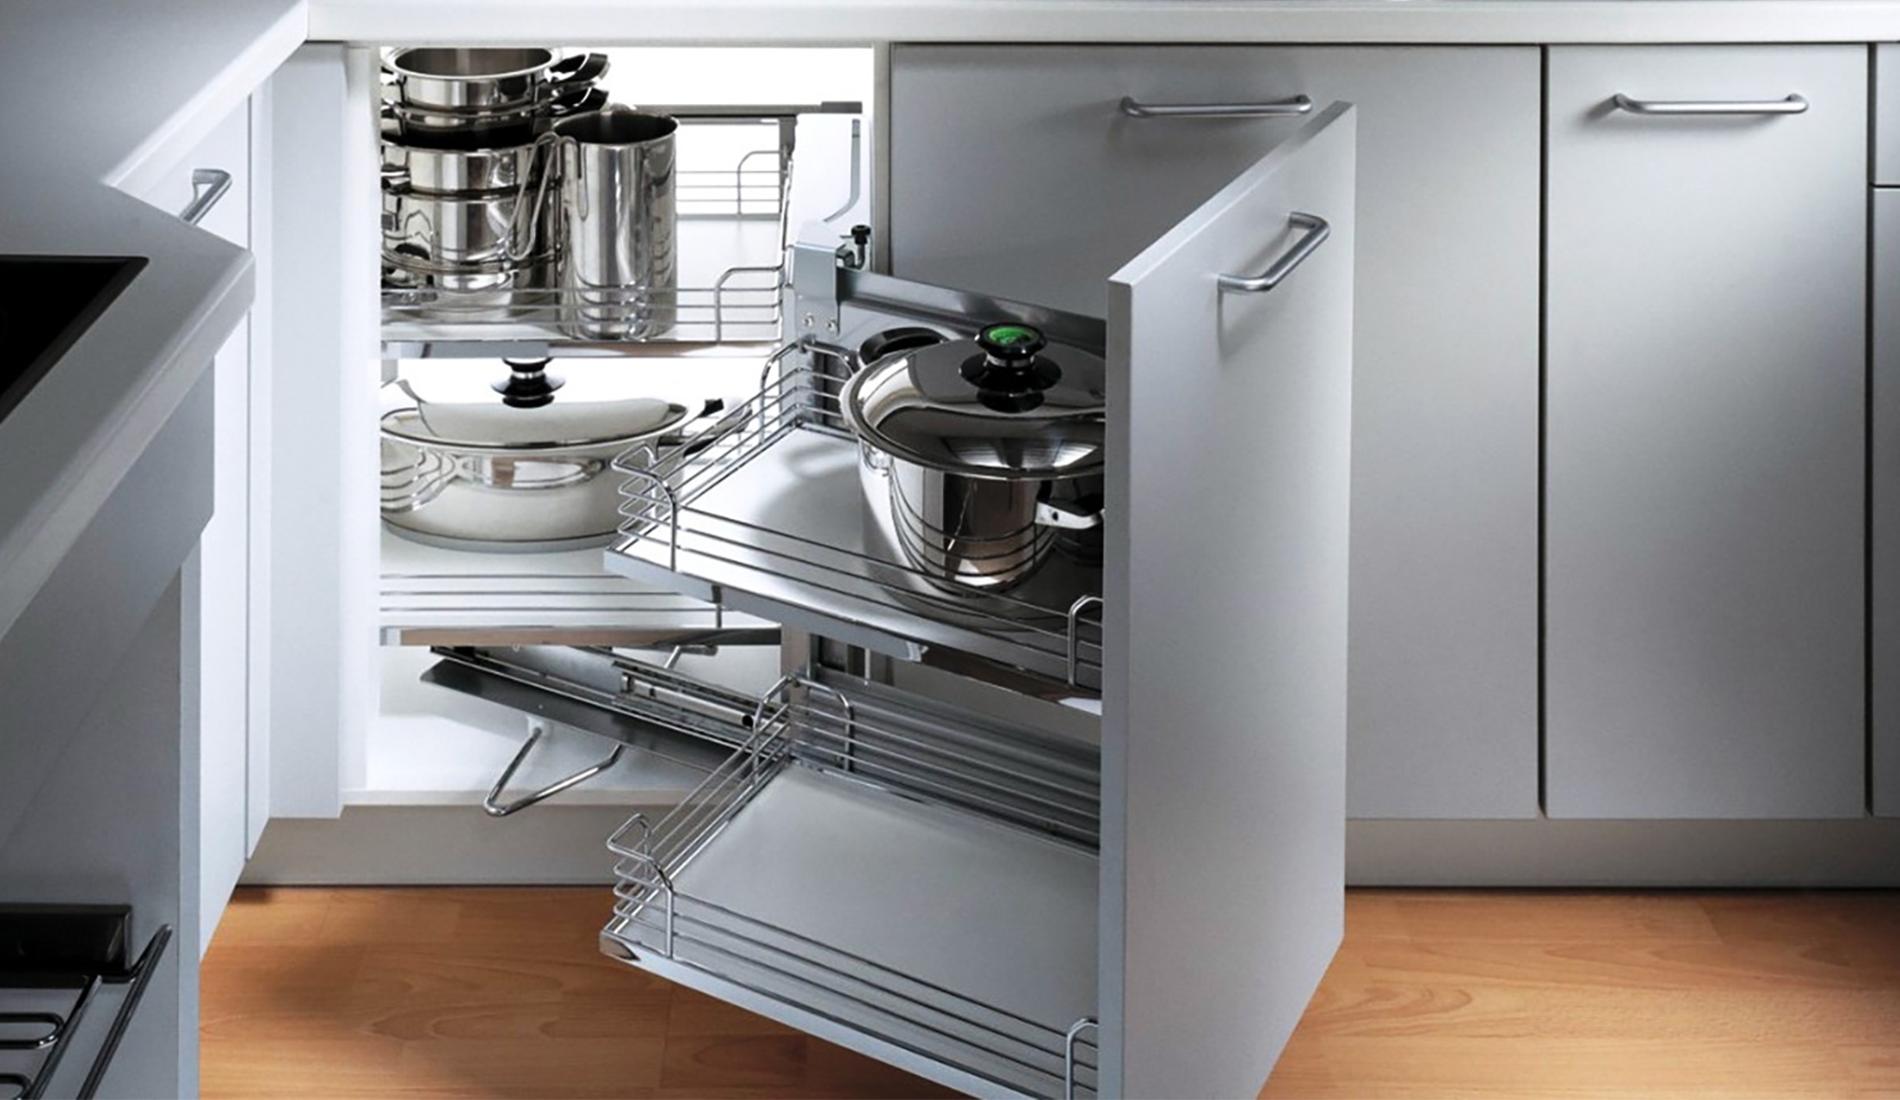 Фурнитура для кухонных шкафов фото